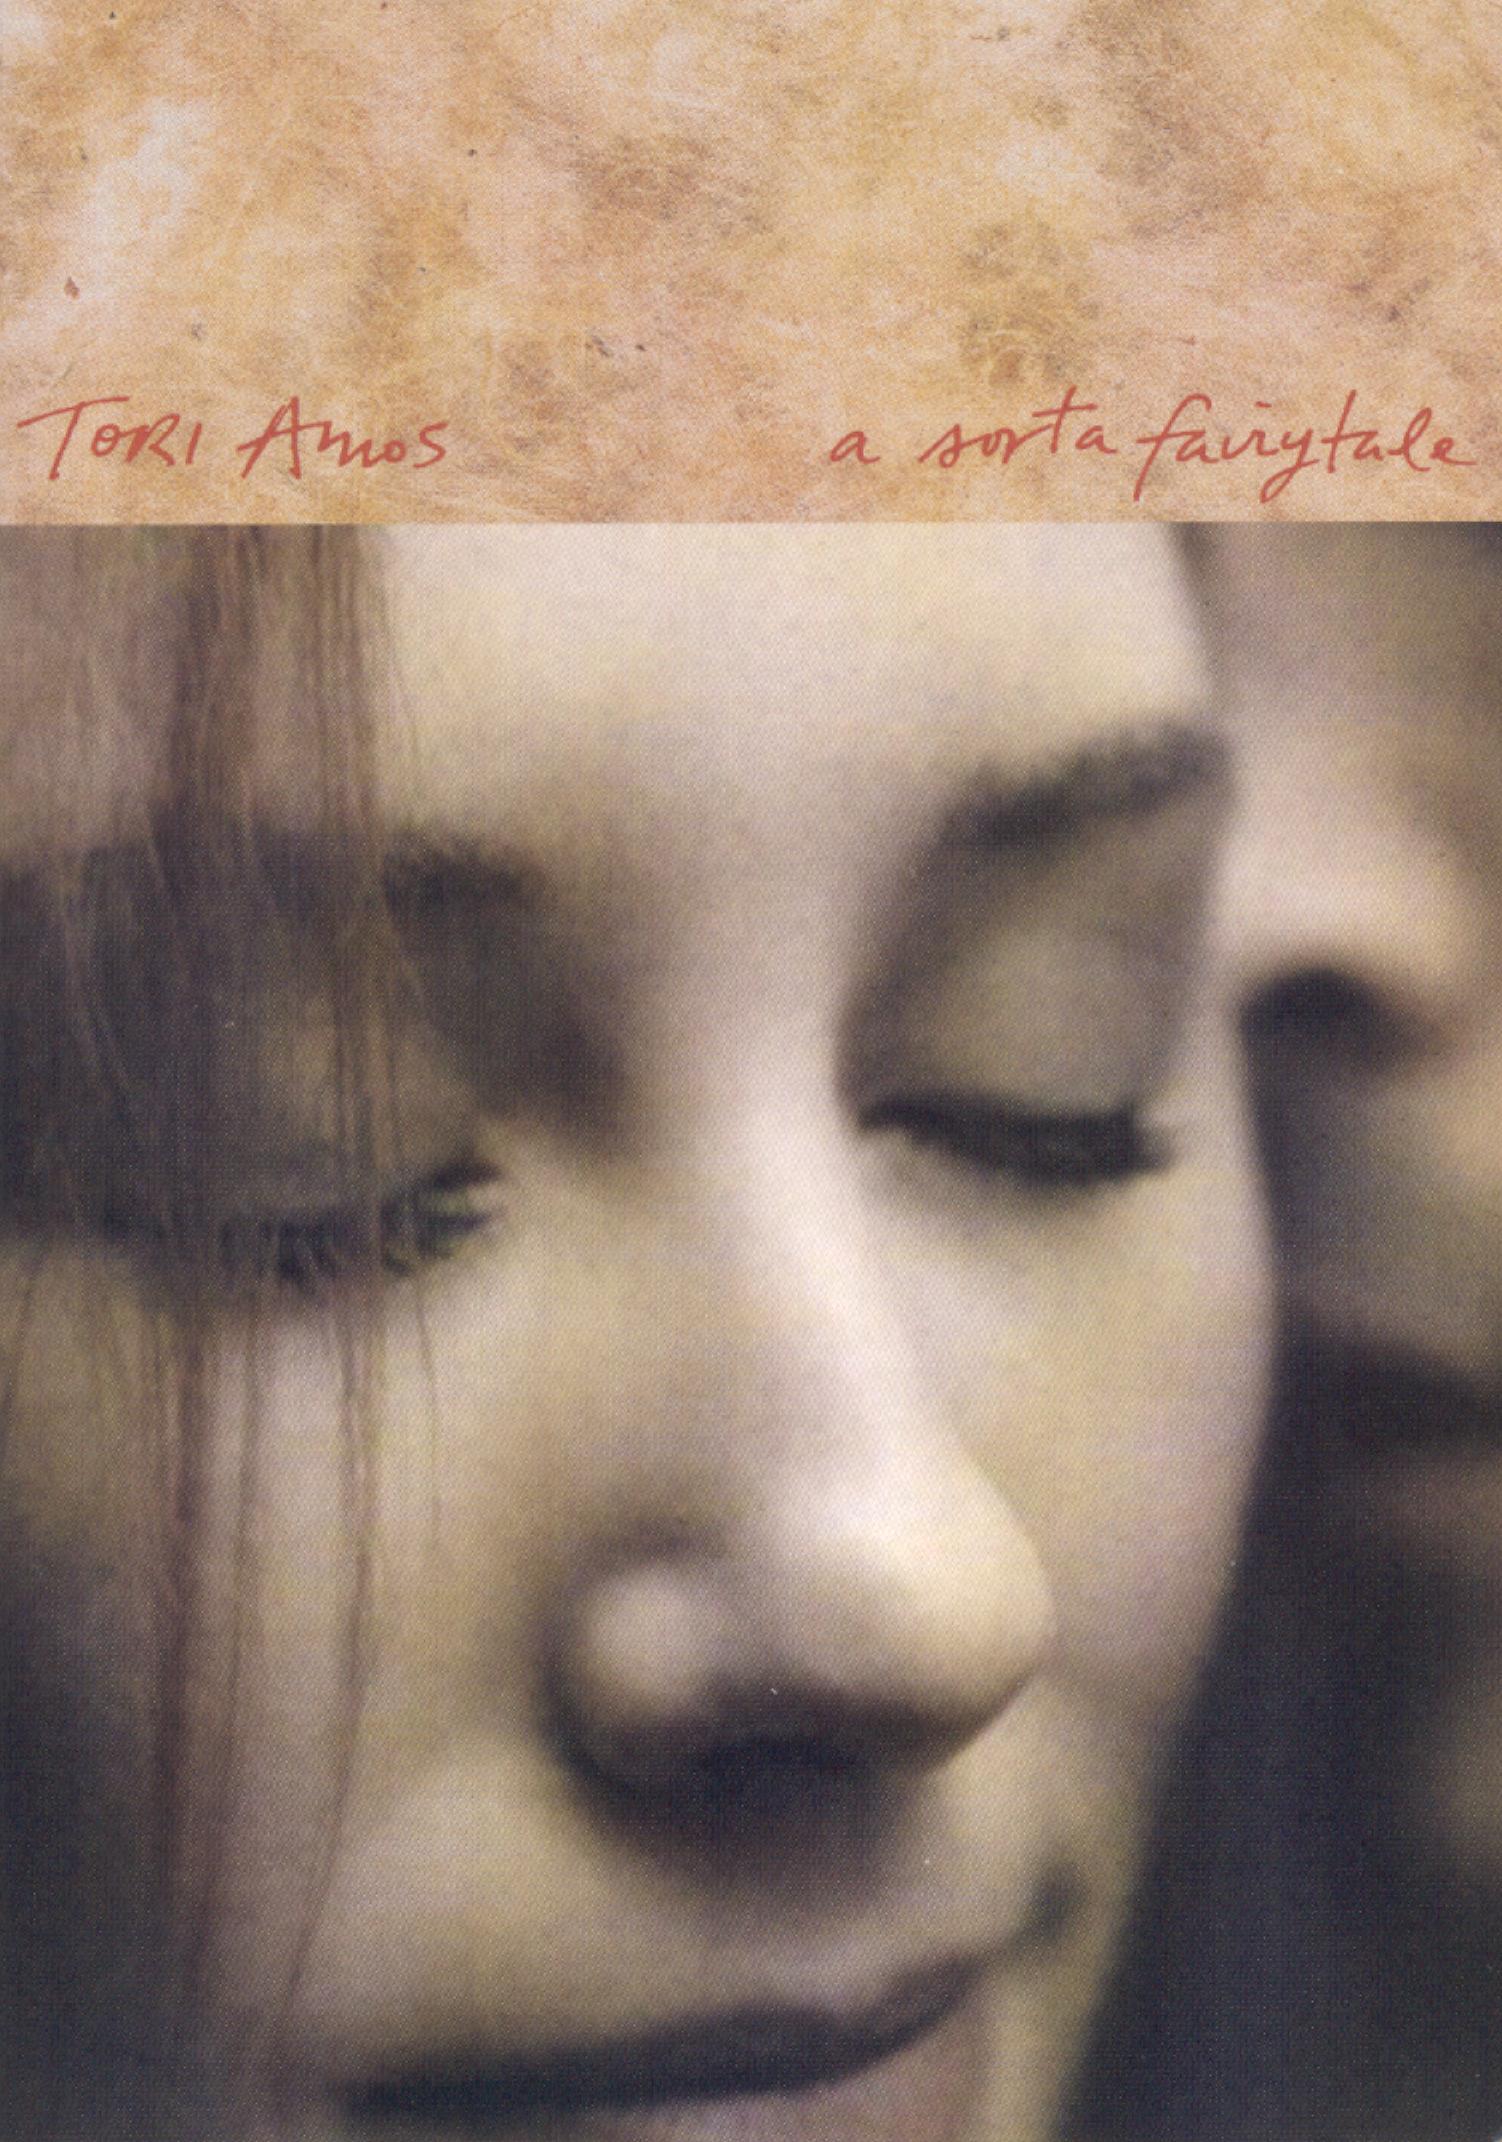 Tori Amos: A Sorta Fairytale [DVD Single]